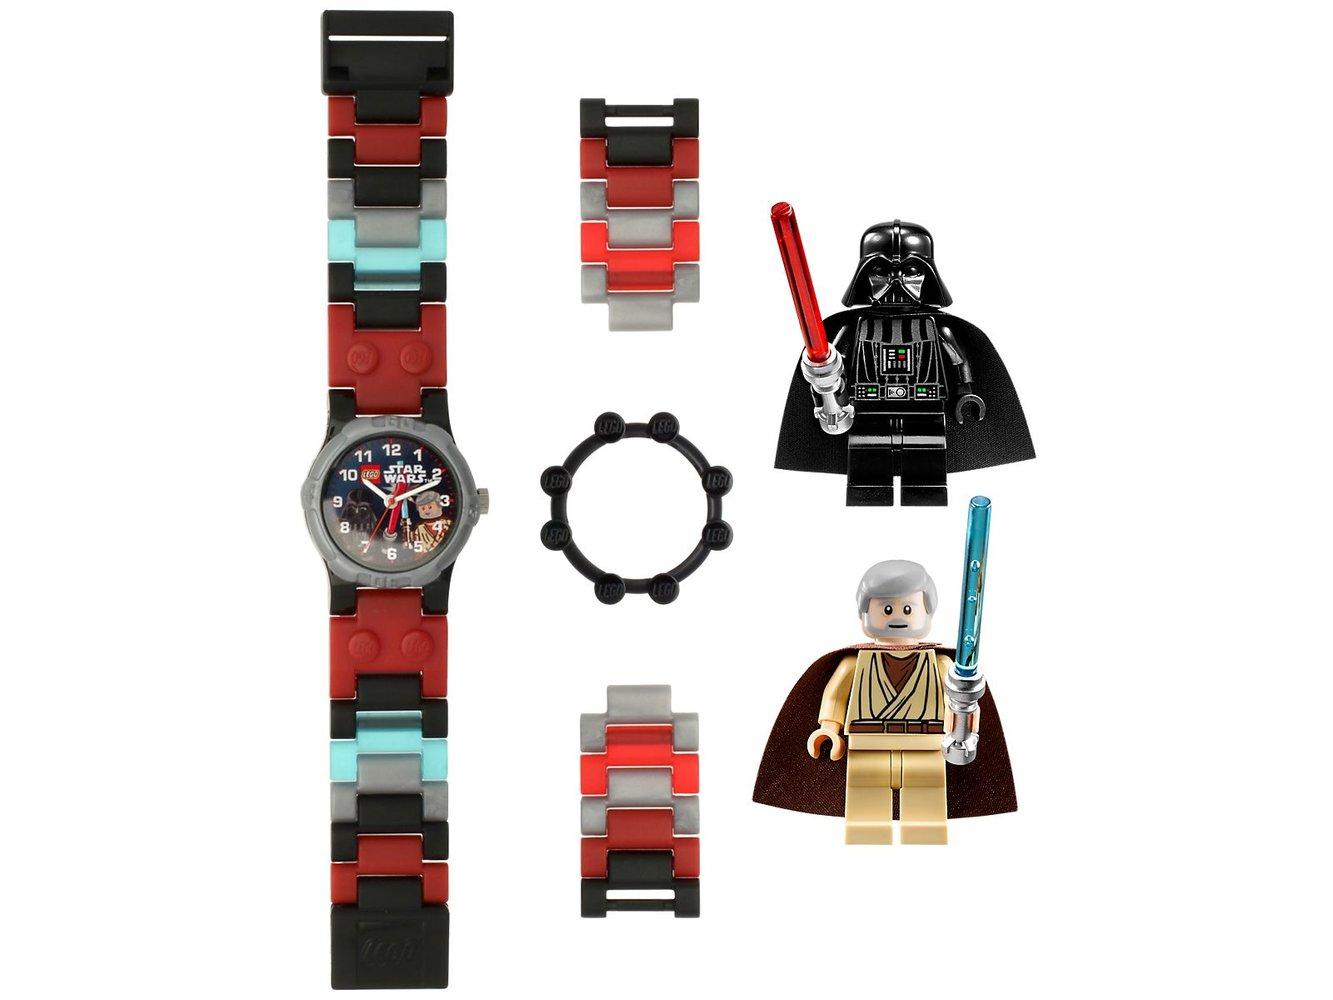 Darth Vader vs Obi-Wan